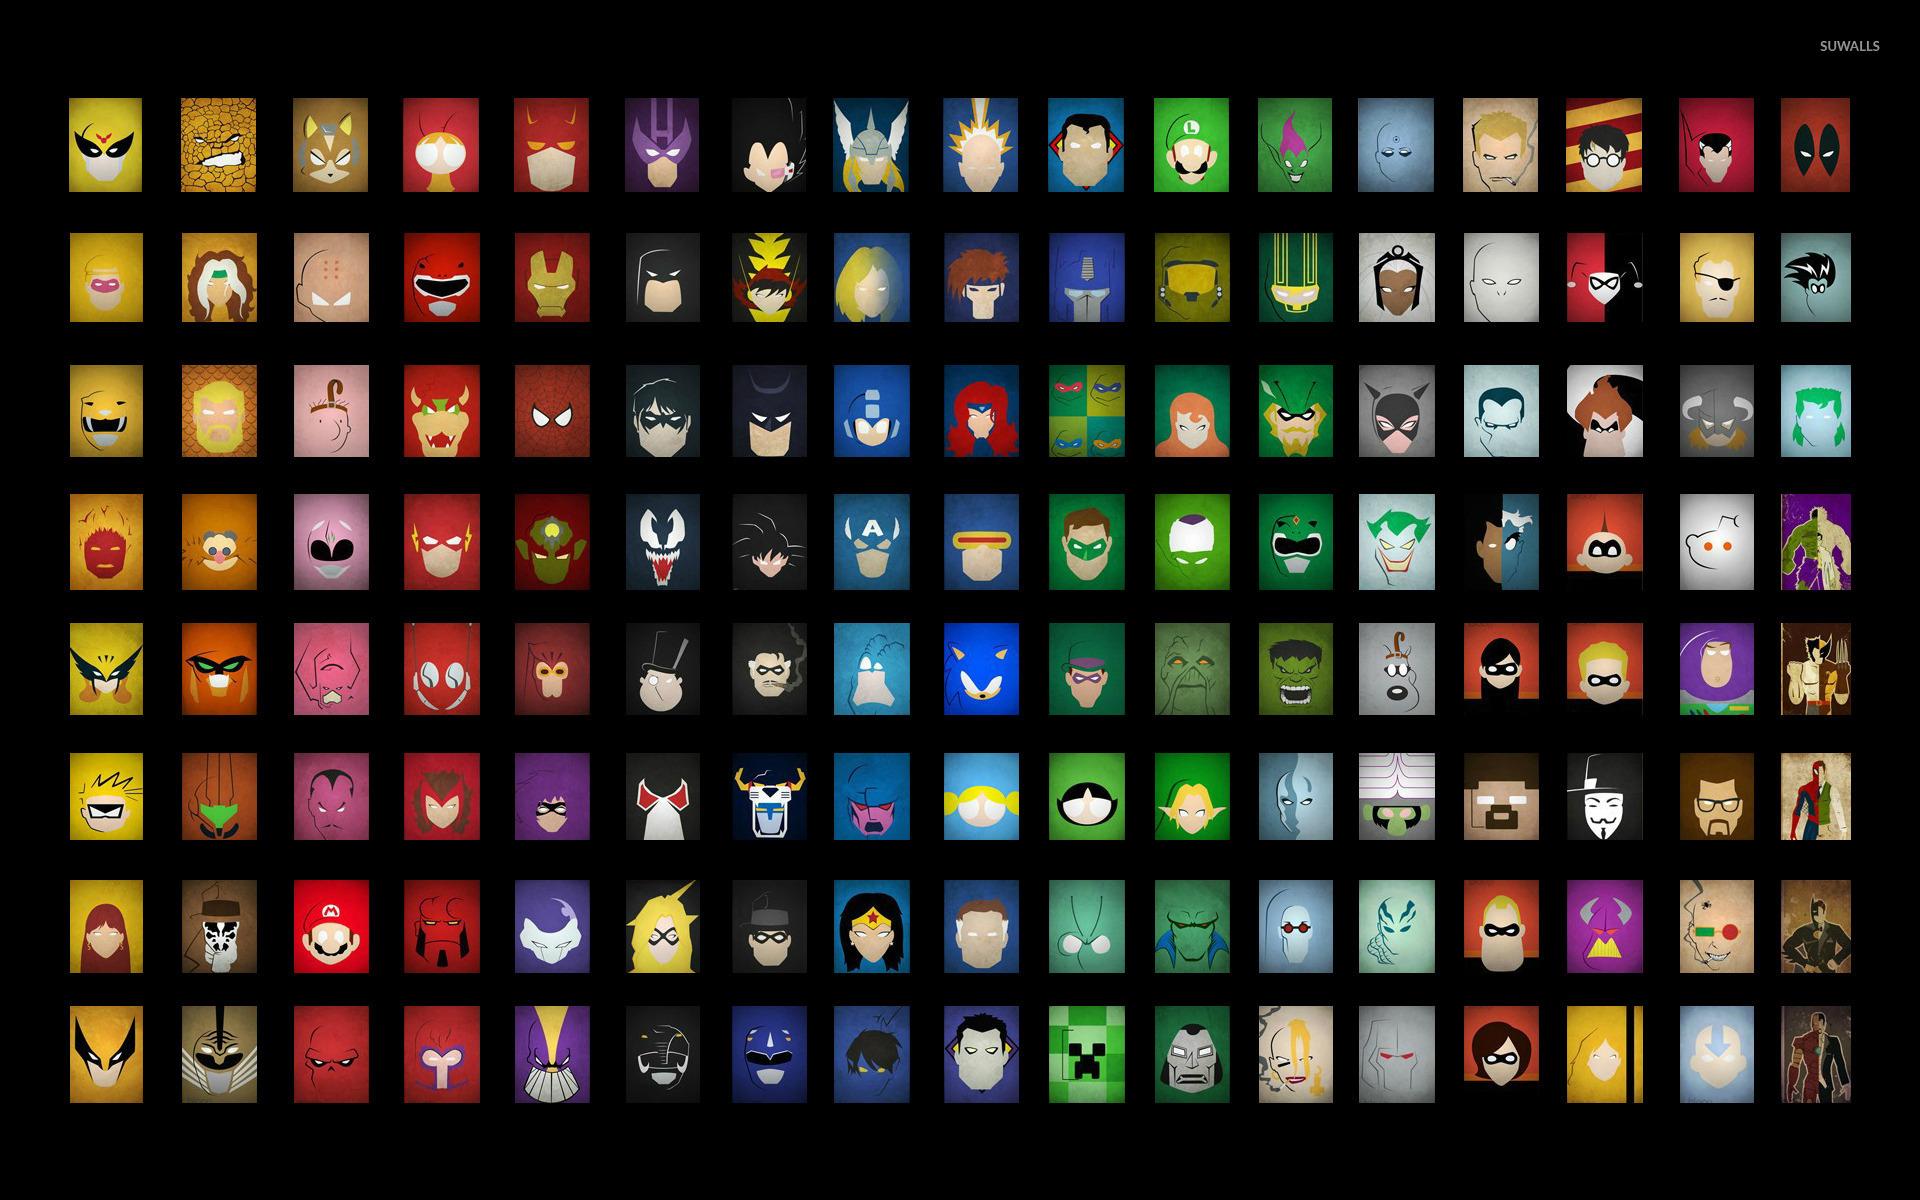 superheroes_21007_1920x1200